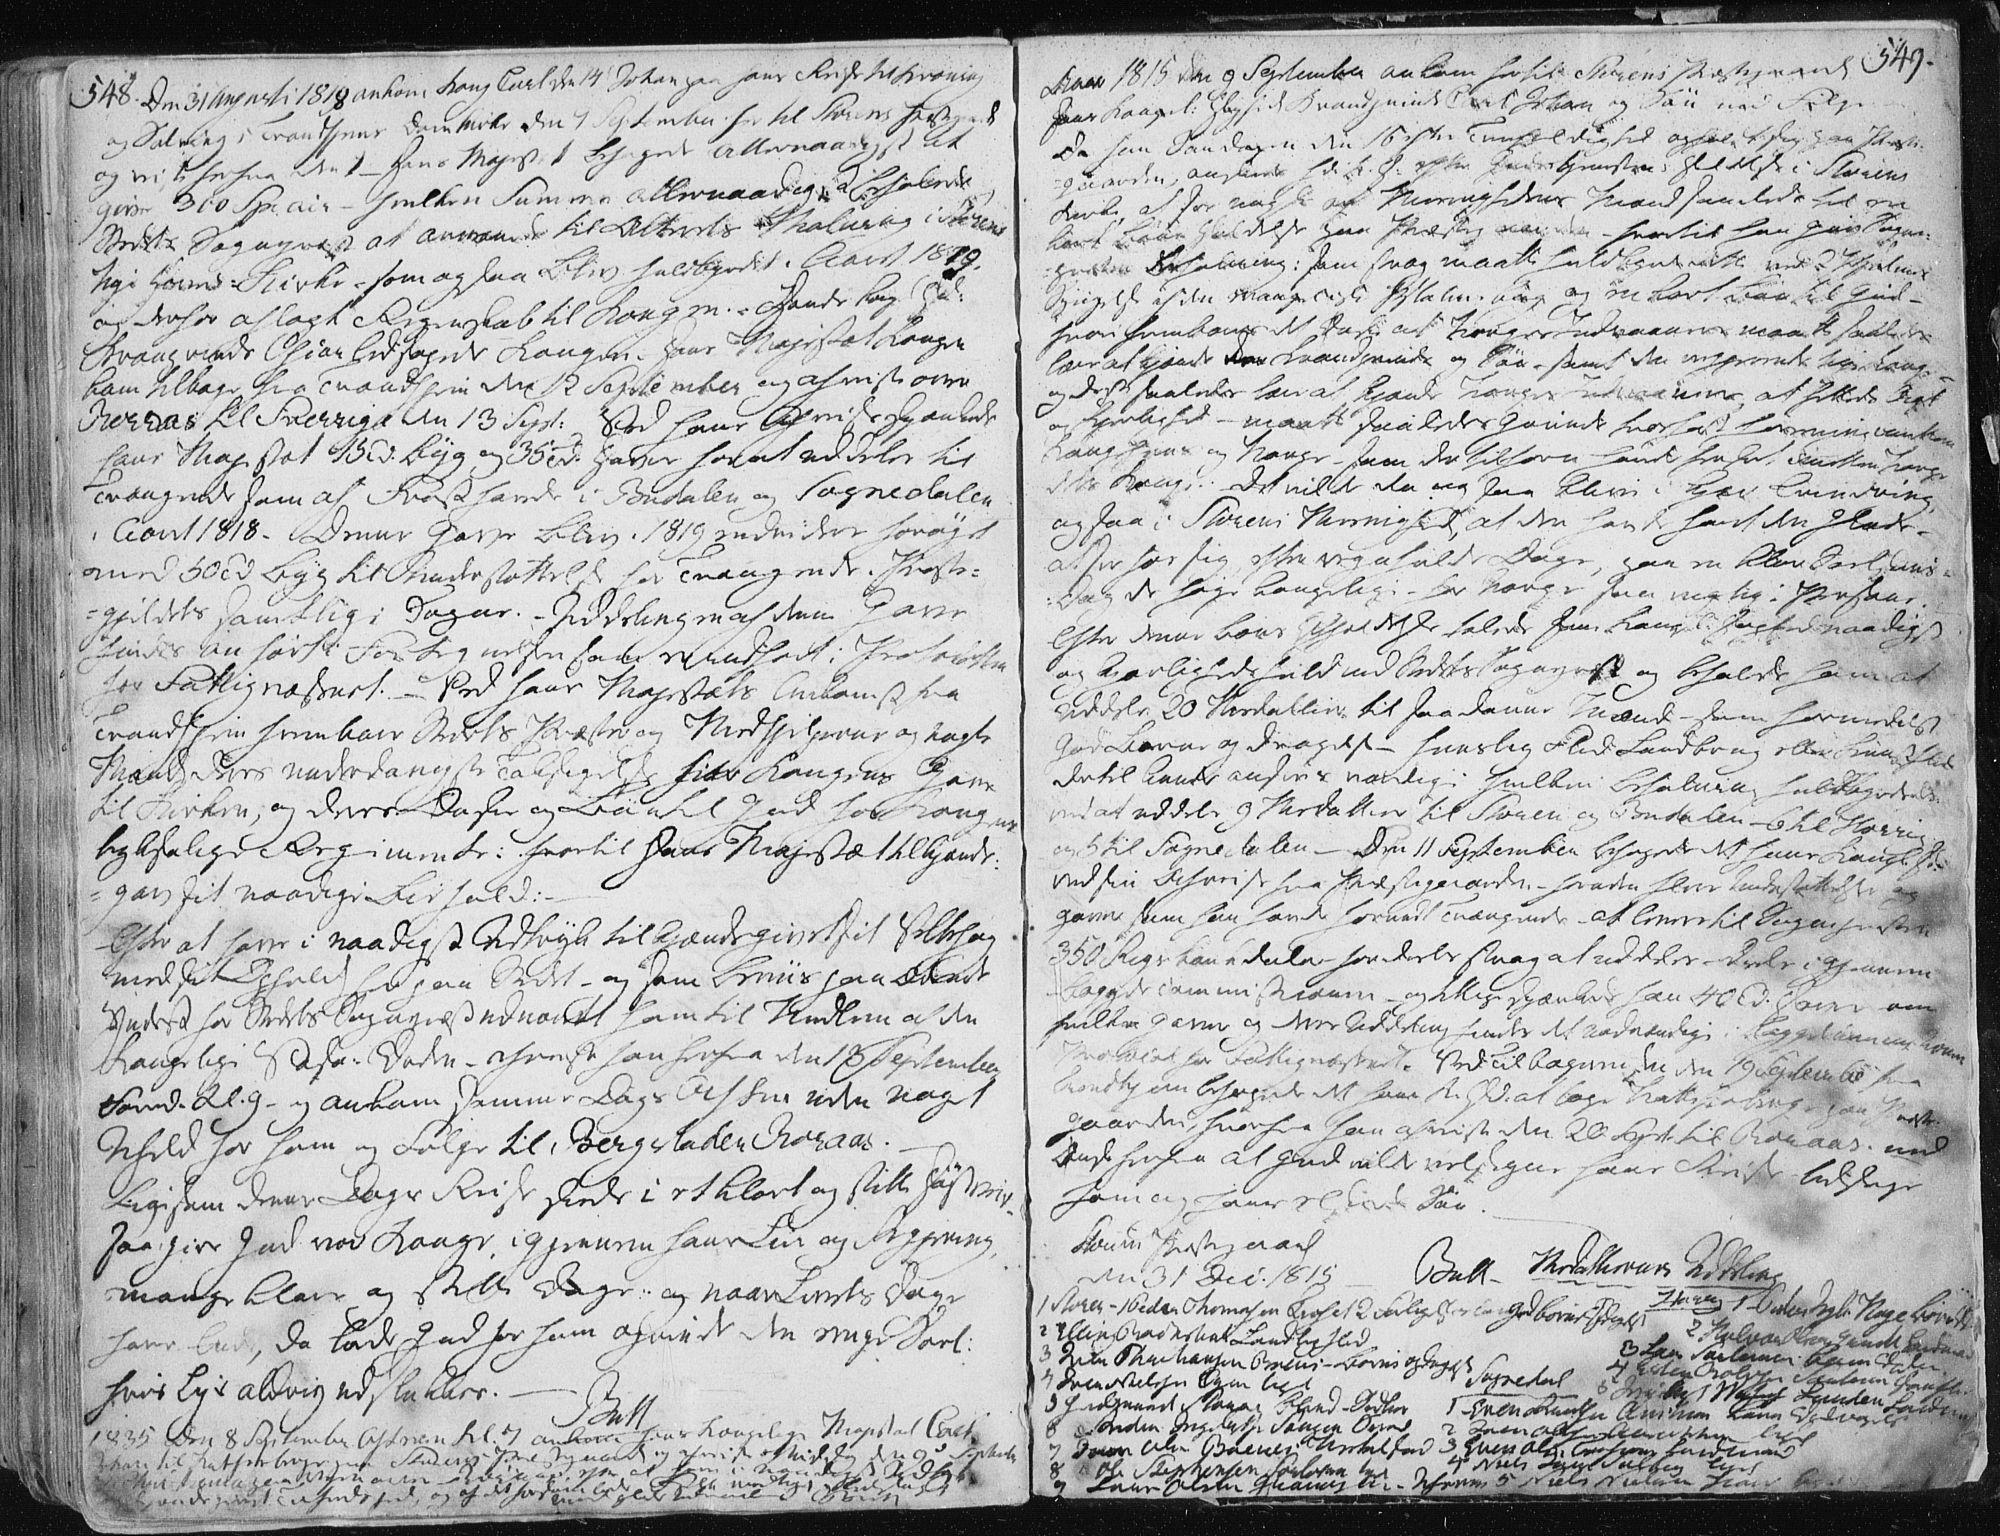 SAT, Ministerialprotokoller, klokkerbøker og fødselsregistre - Sør-Trøndelag, 687/L0992: Parish register (official) no. 687A03 /1, 1788-1815, p. 548-549